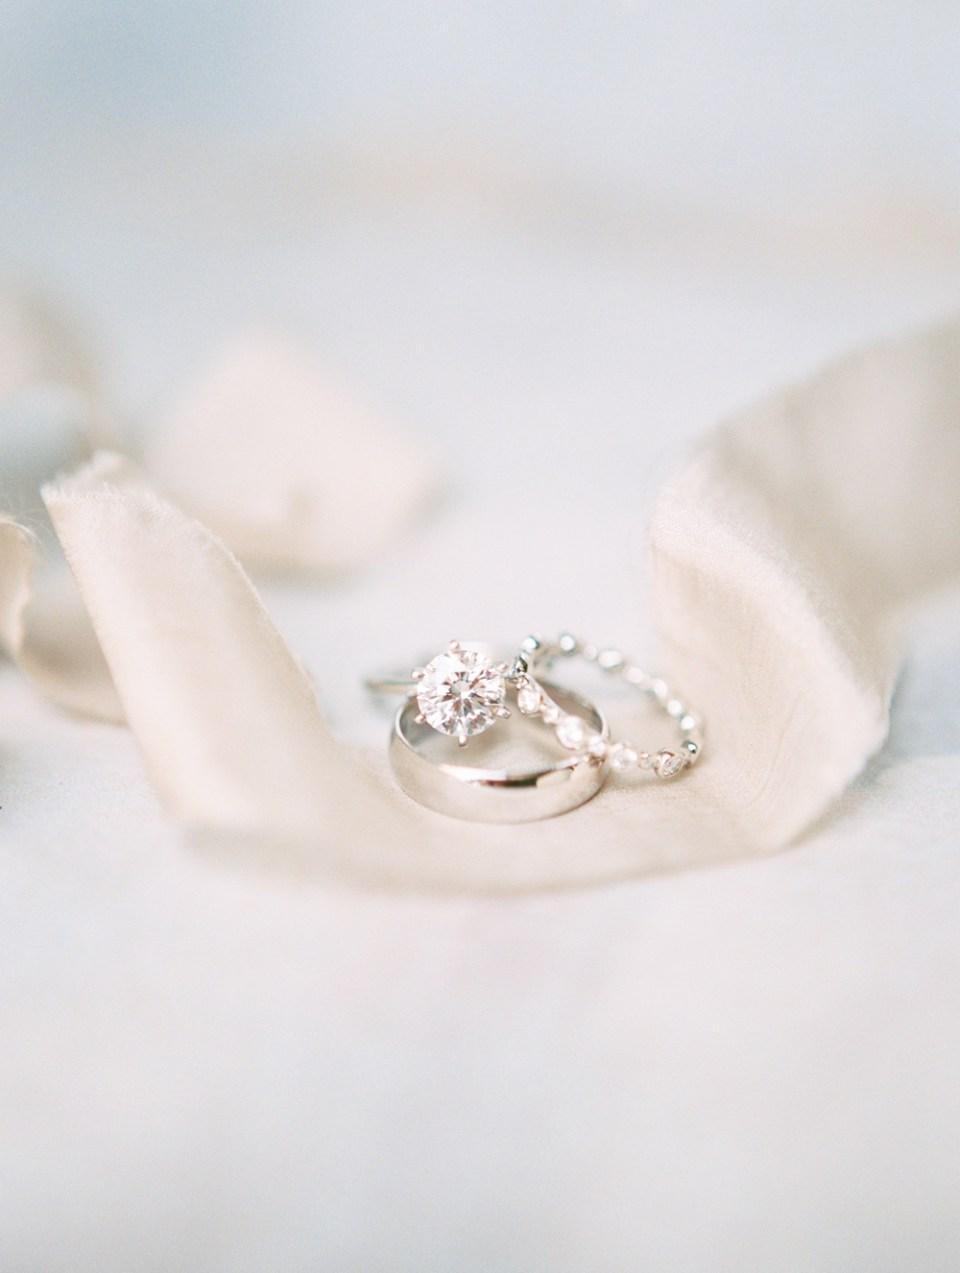 Hilton La Jolla Torrey Pines Wedding Rings